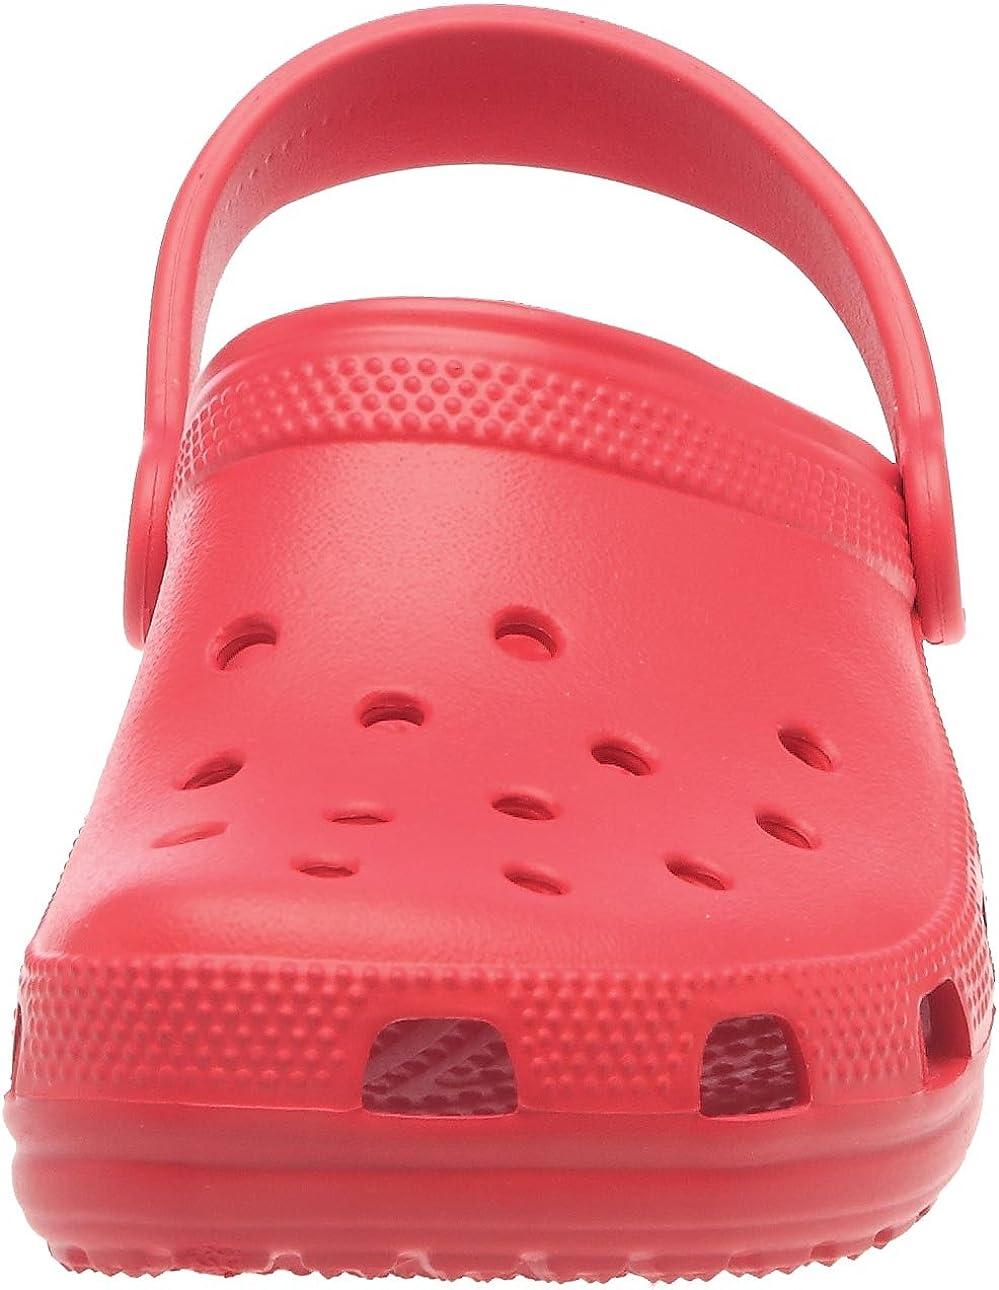 Crocs Girls Kids Classic Ankle-High Rubber Flat Shoe